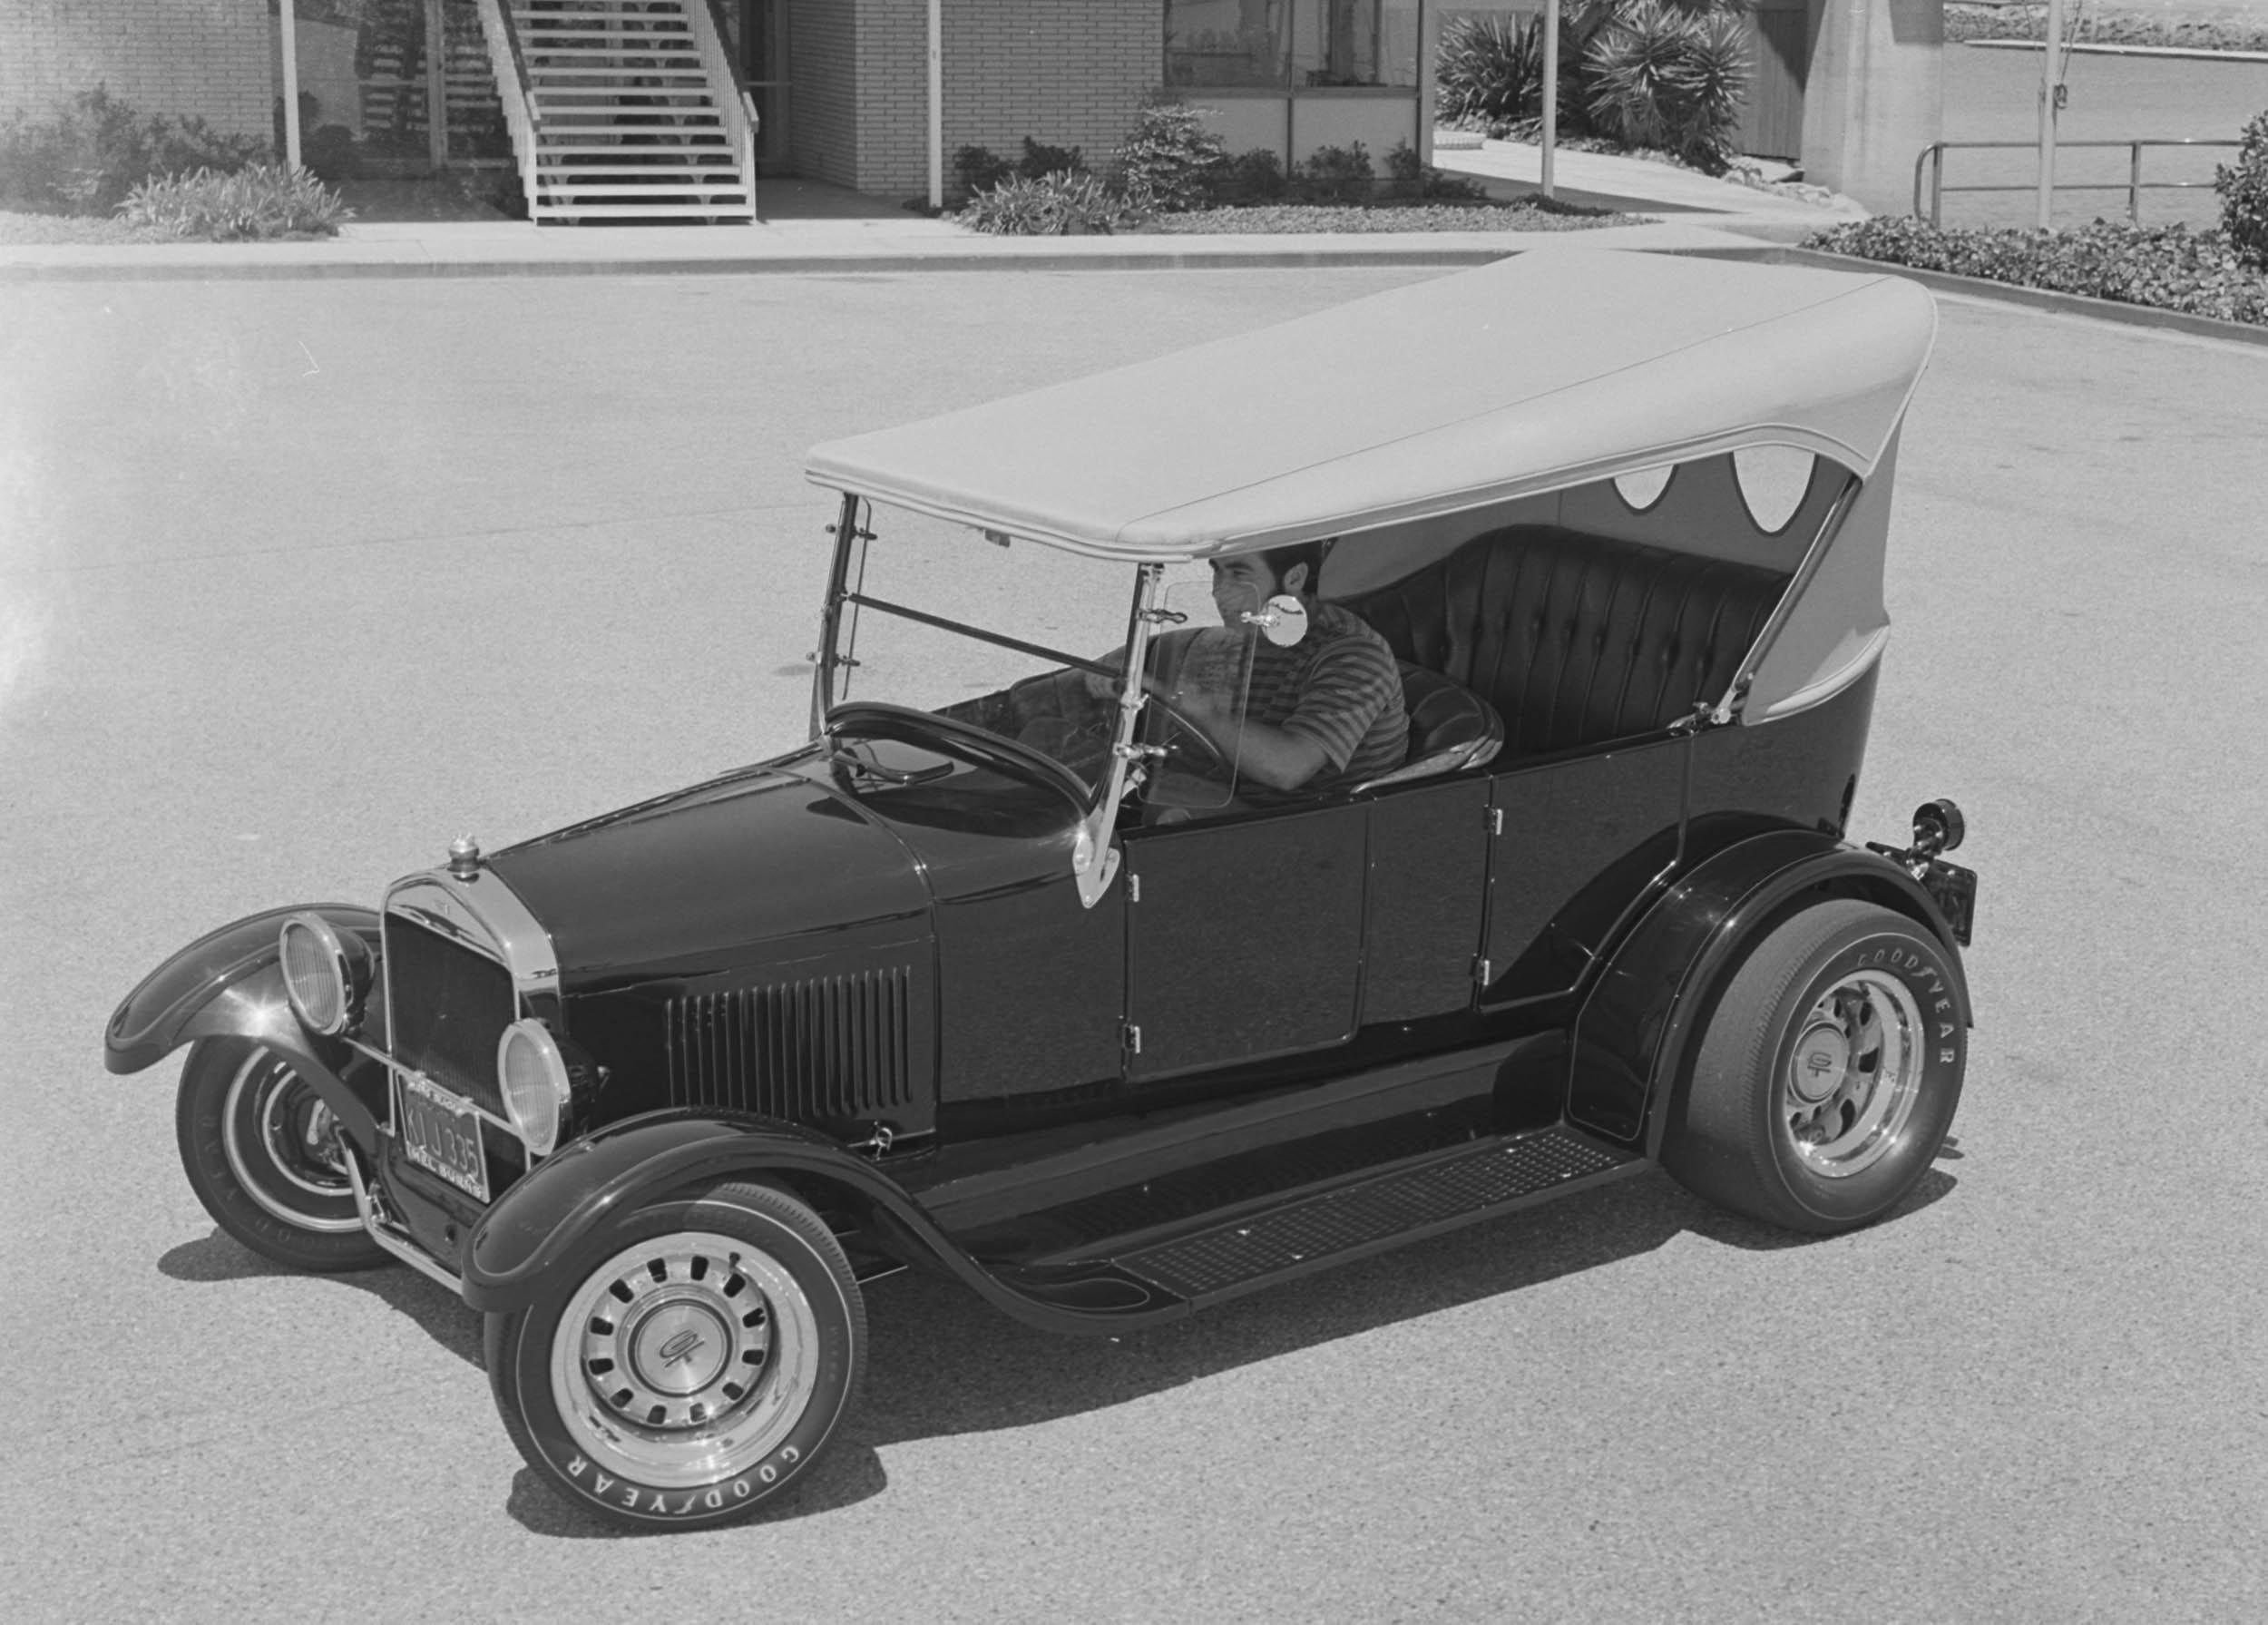 1927 Model T touring